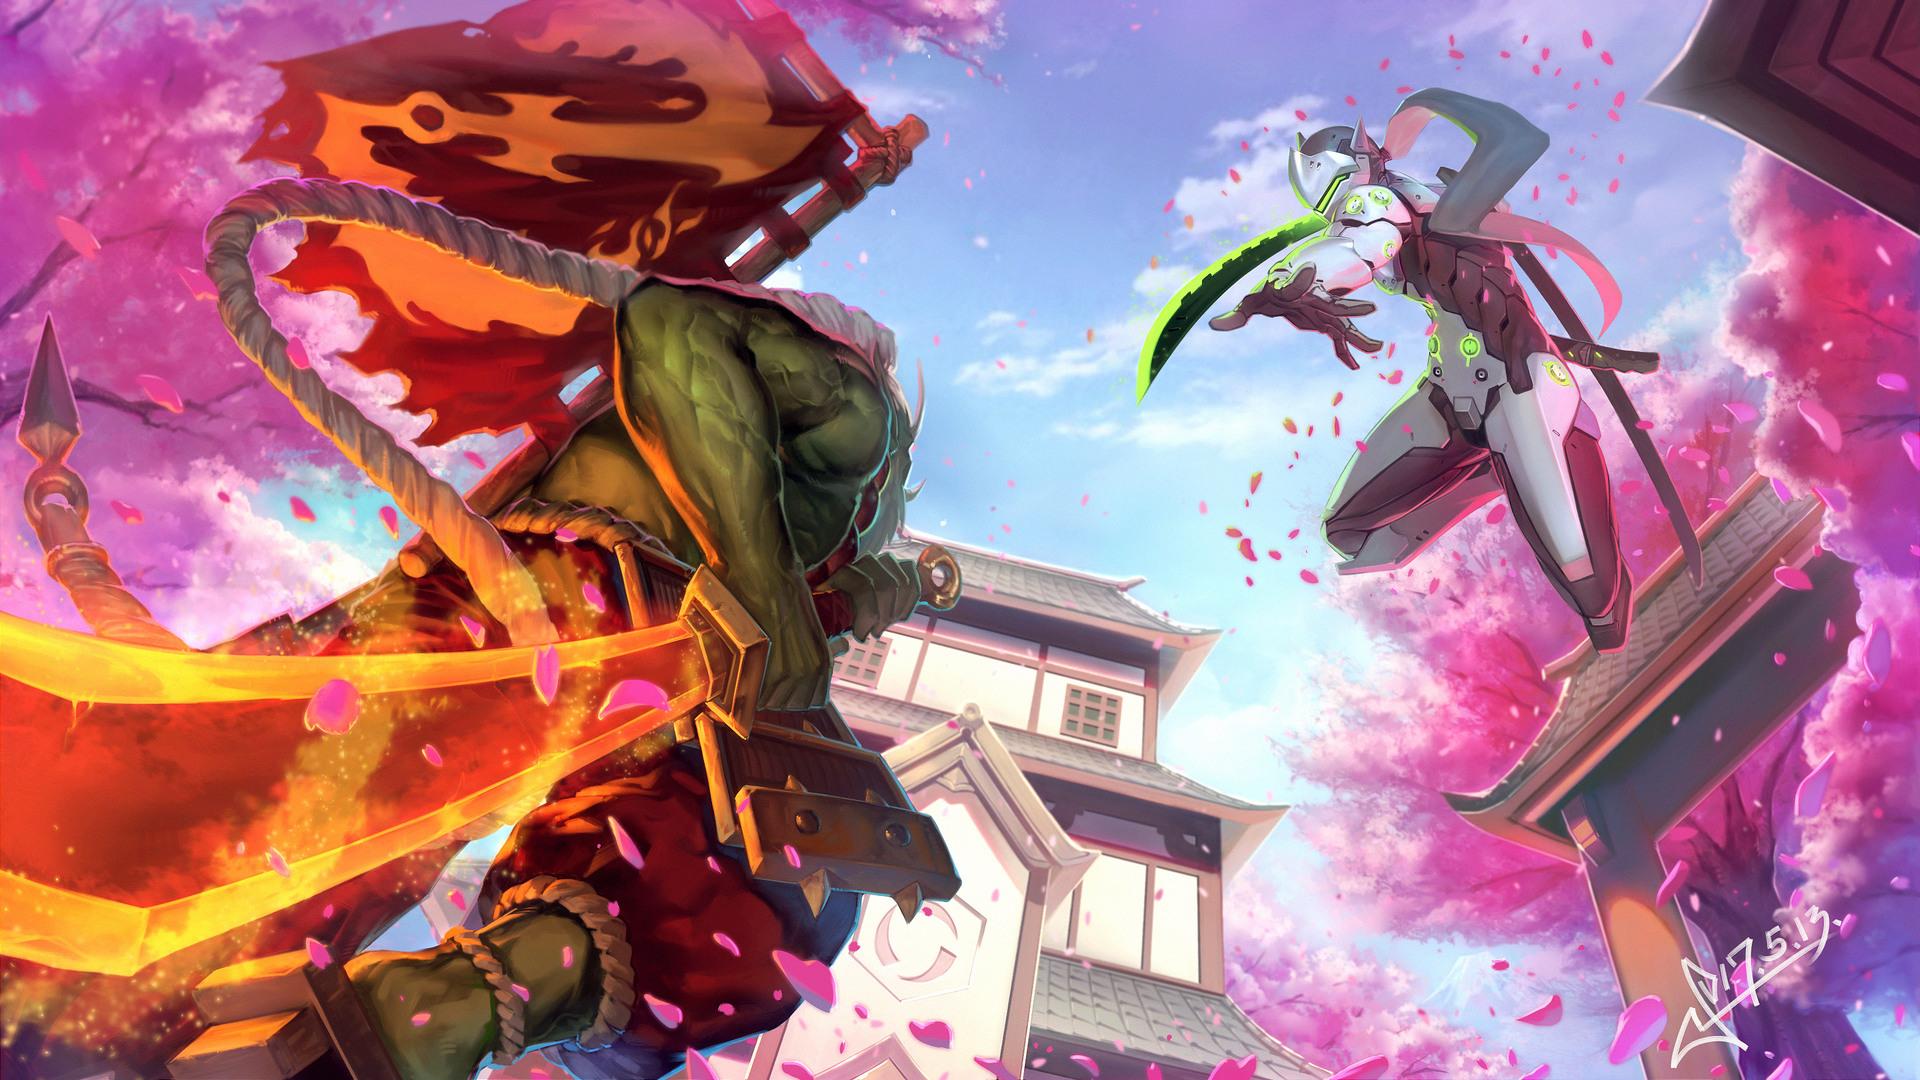 Overwatch Wallpaper 1080p Download Free Cool High: 1920x1080 Genji Overwatch Sakura Samurai Laptop Full HD